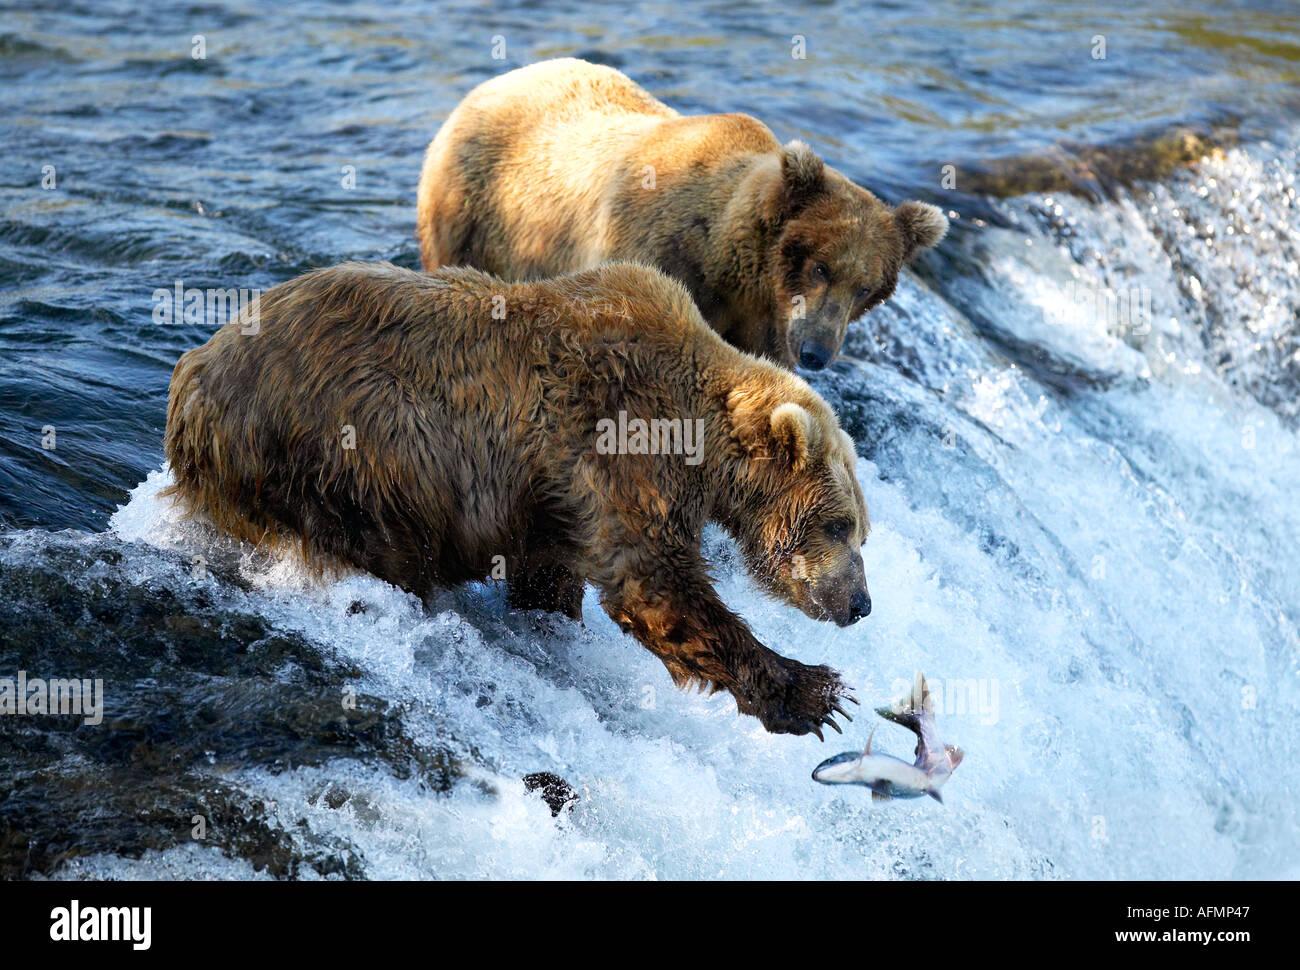 Orso bruno la pesca Brooks Falls Katmai National Park in Alaska Immagini Stock